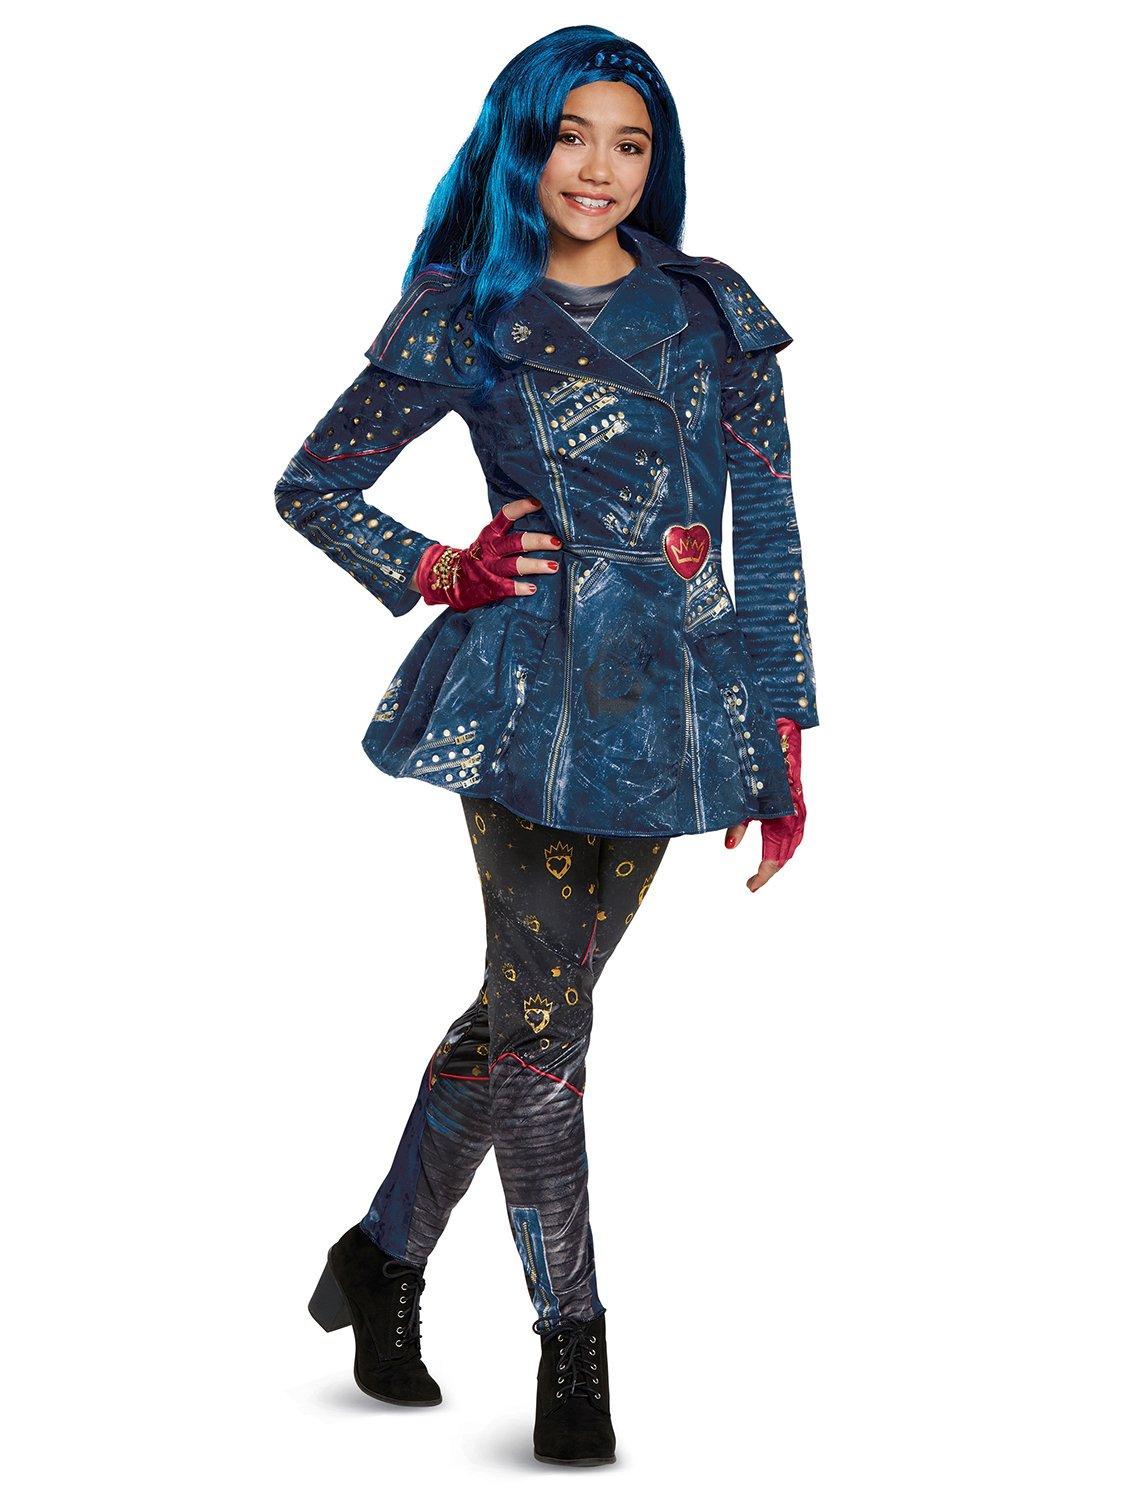 Disguise Evie Deluxe Descendants 2 Costume, Blue, Medium (7-8)